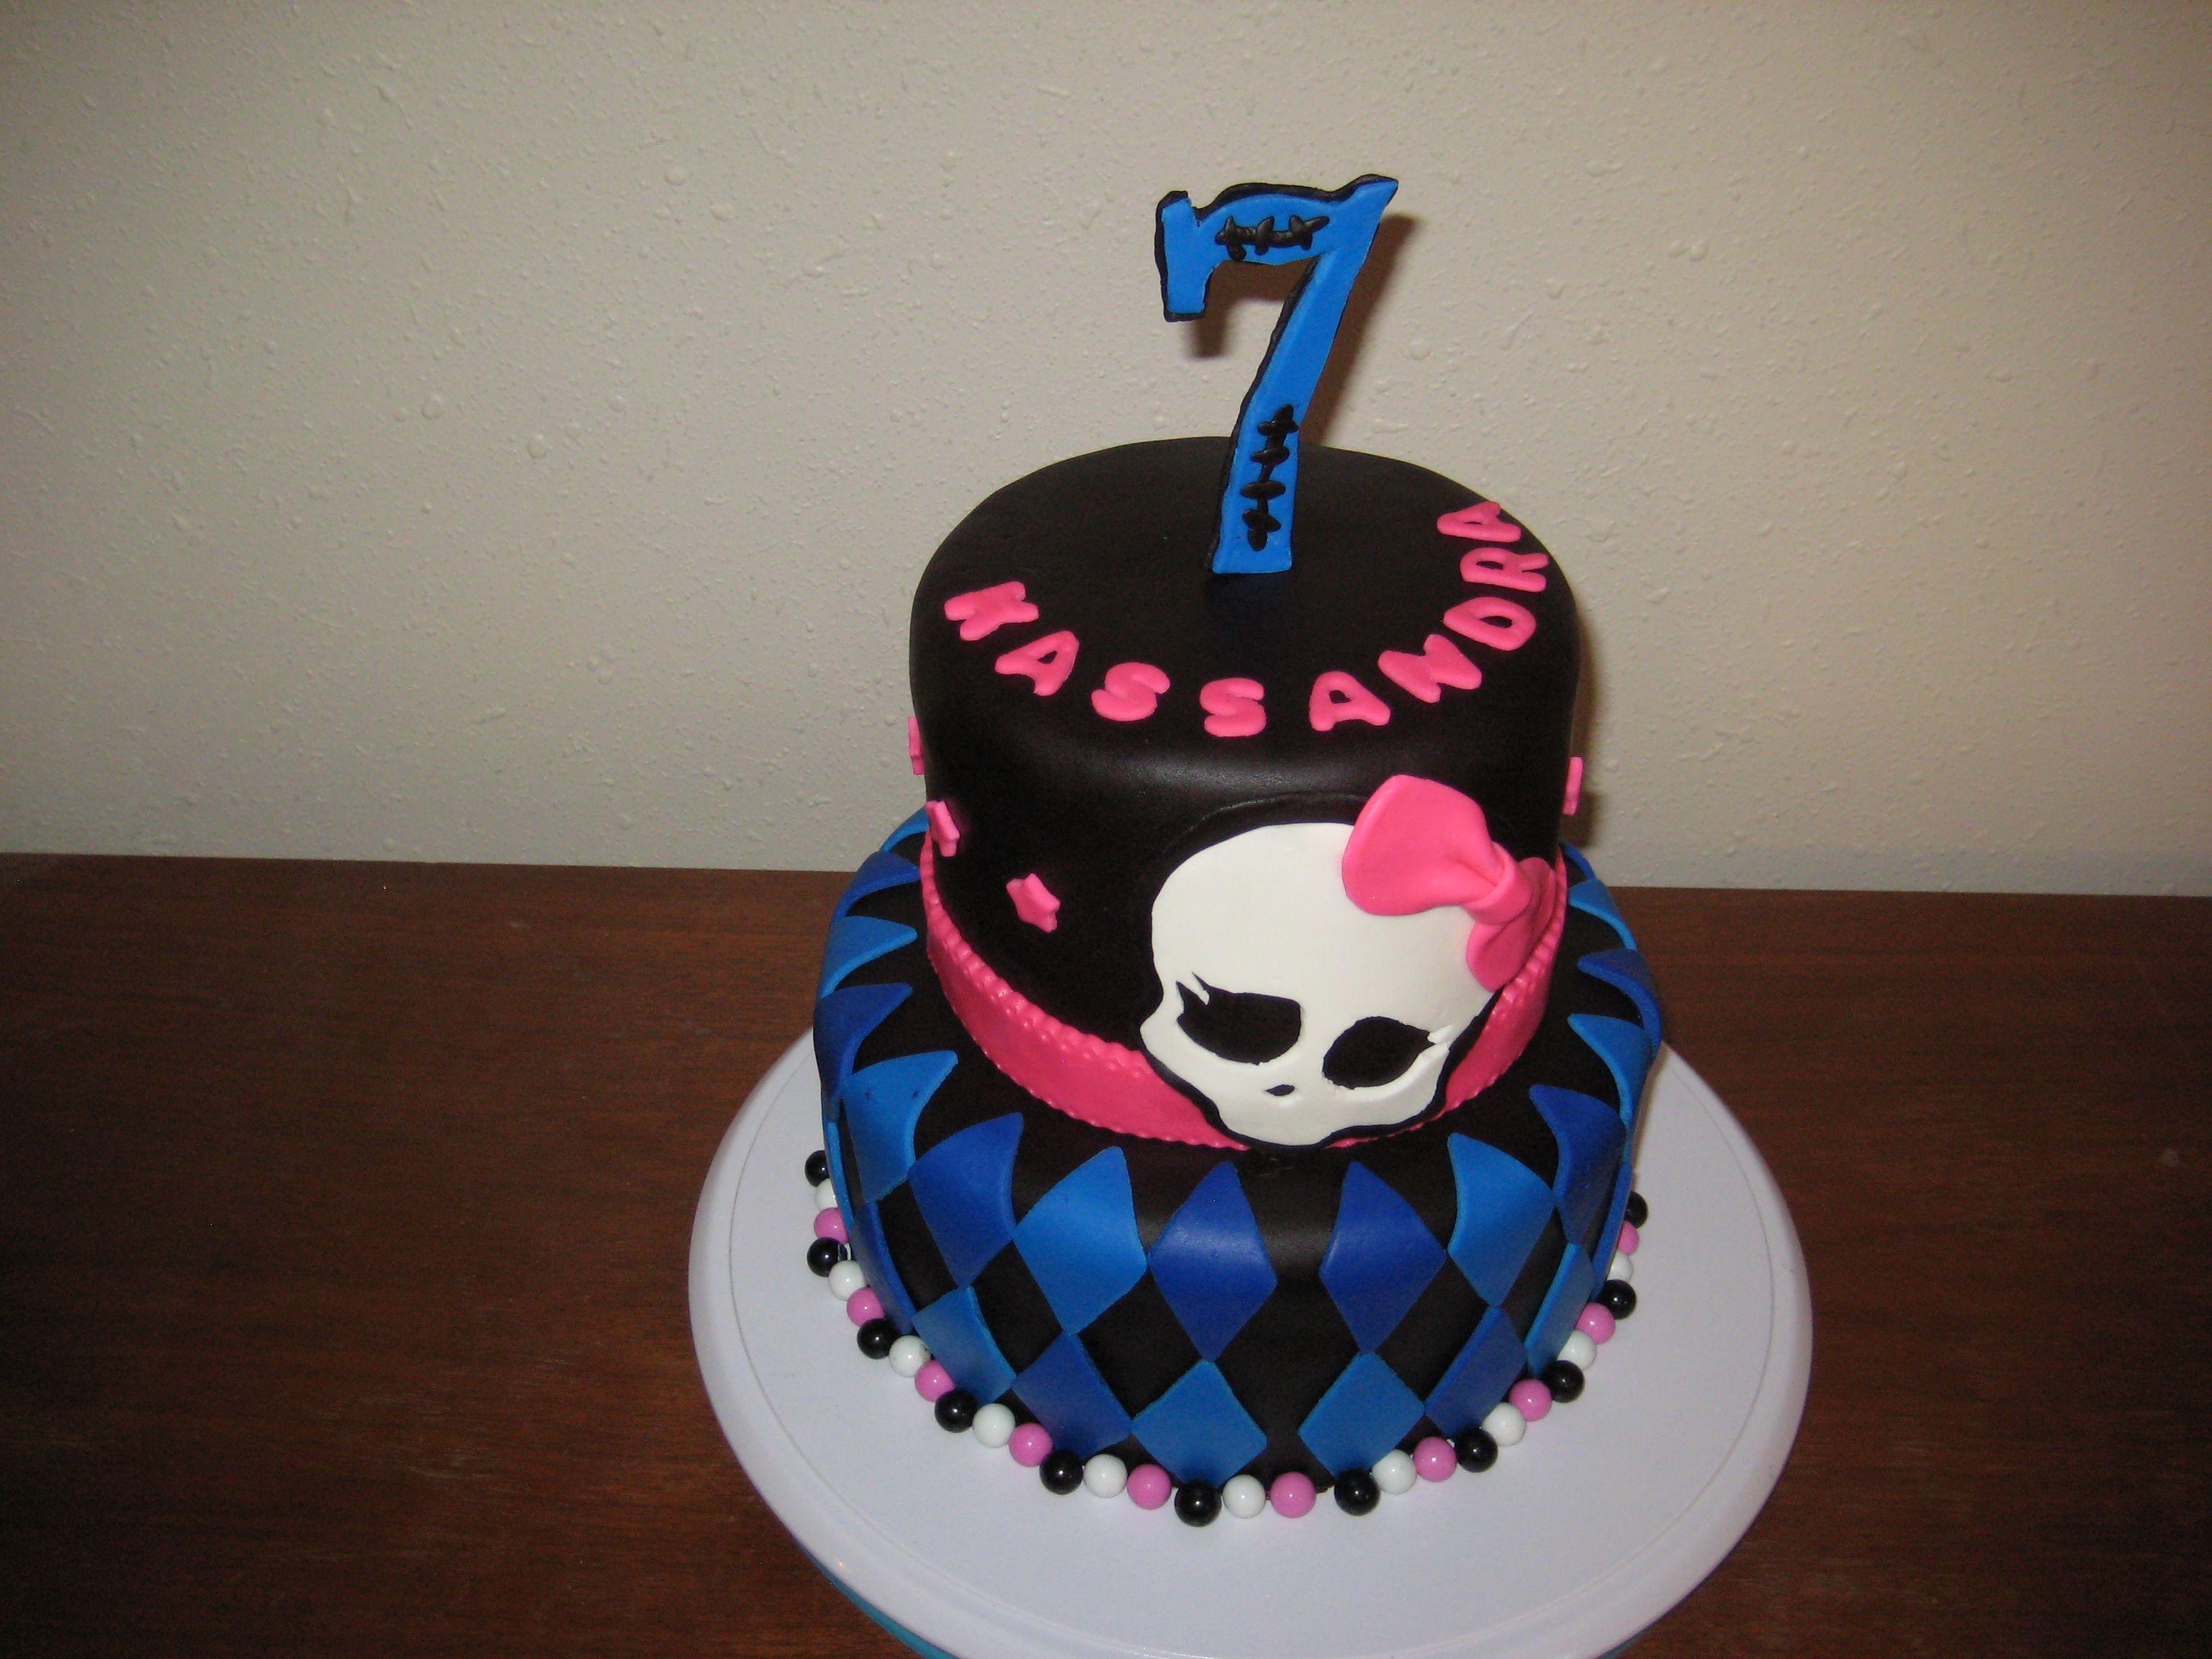 high cake cake decorating ideas